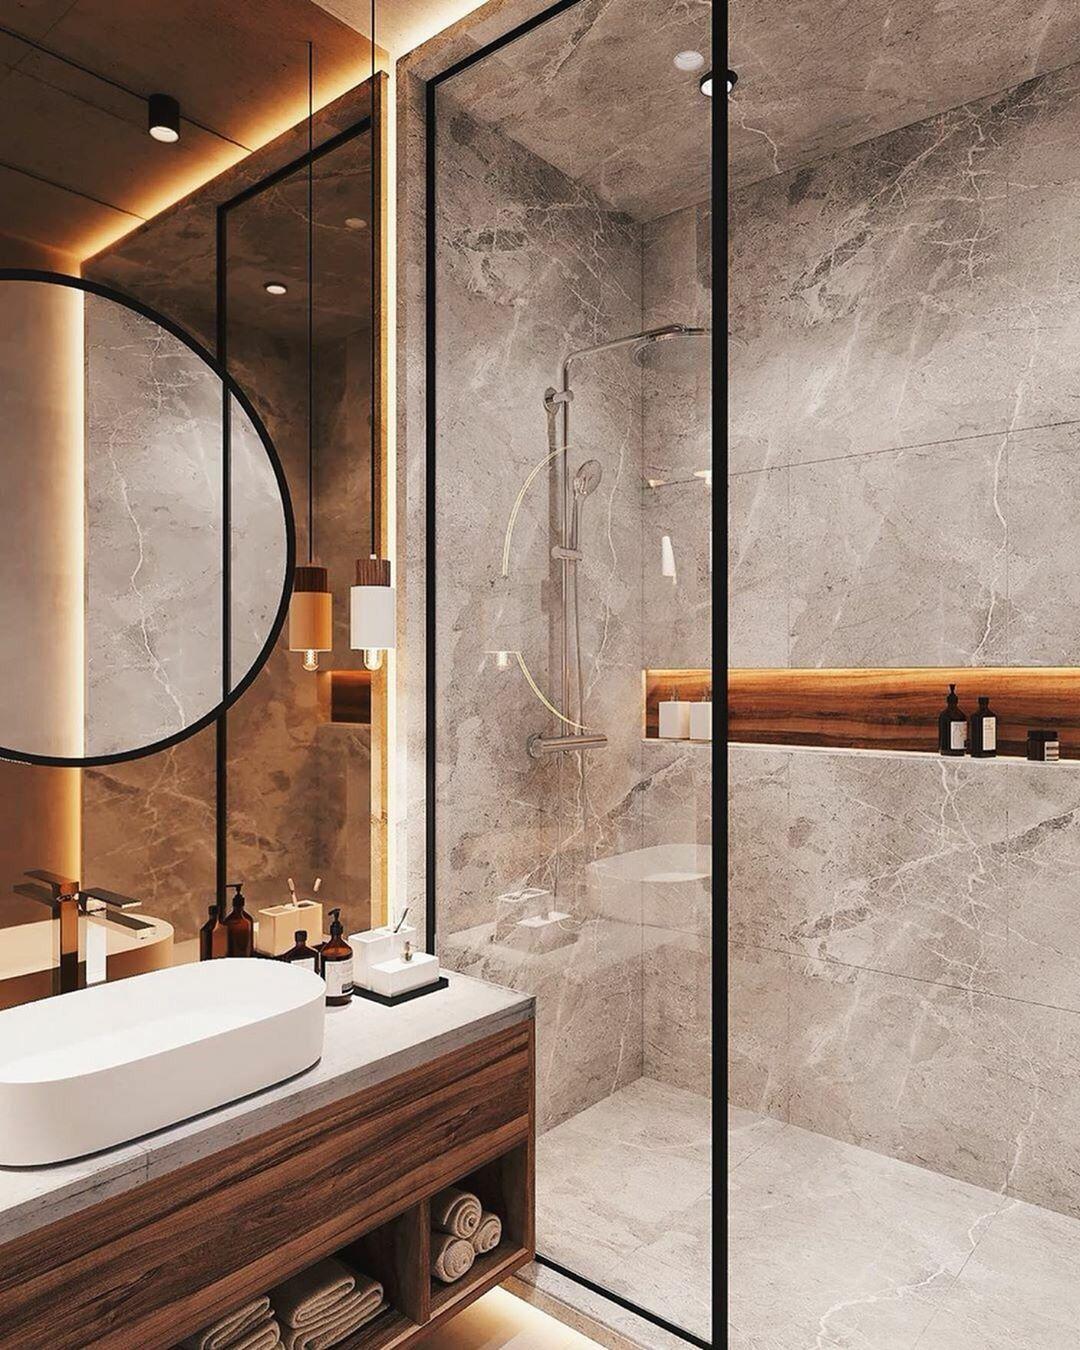 Bathroom Inspiration Interior Of Loft Decoration Homedecor Homedesign Homeideas Bathroom Decor Luxury Modern Bathroom Design Bathroom Interior Design